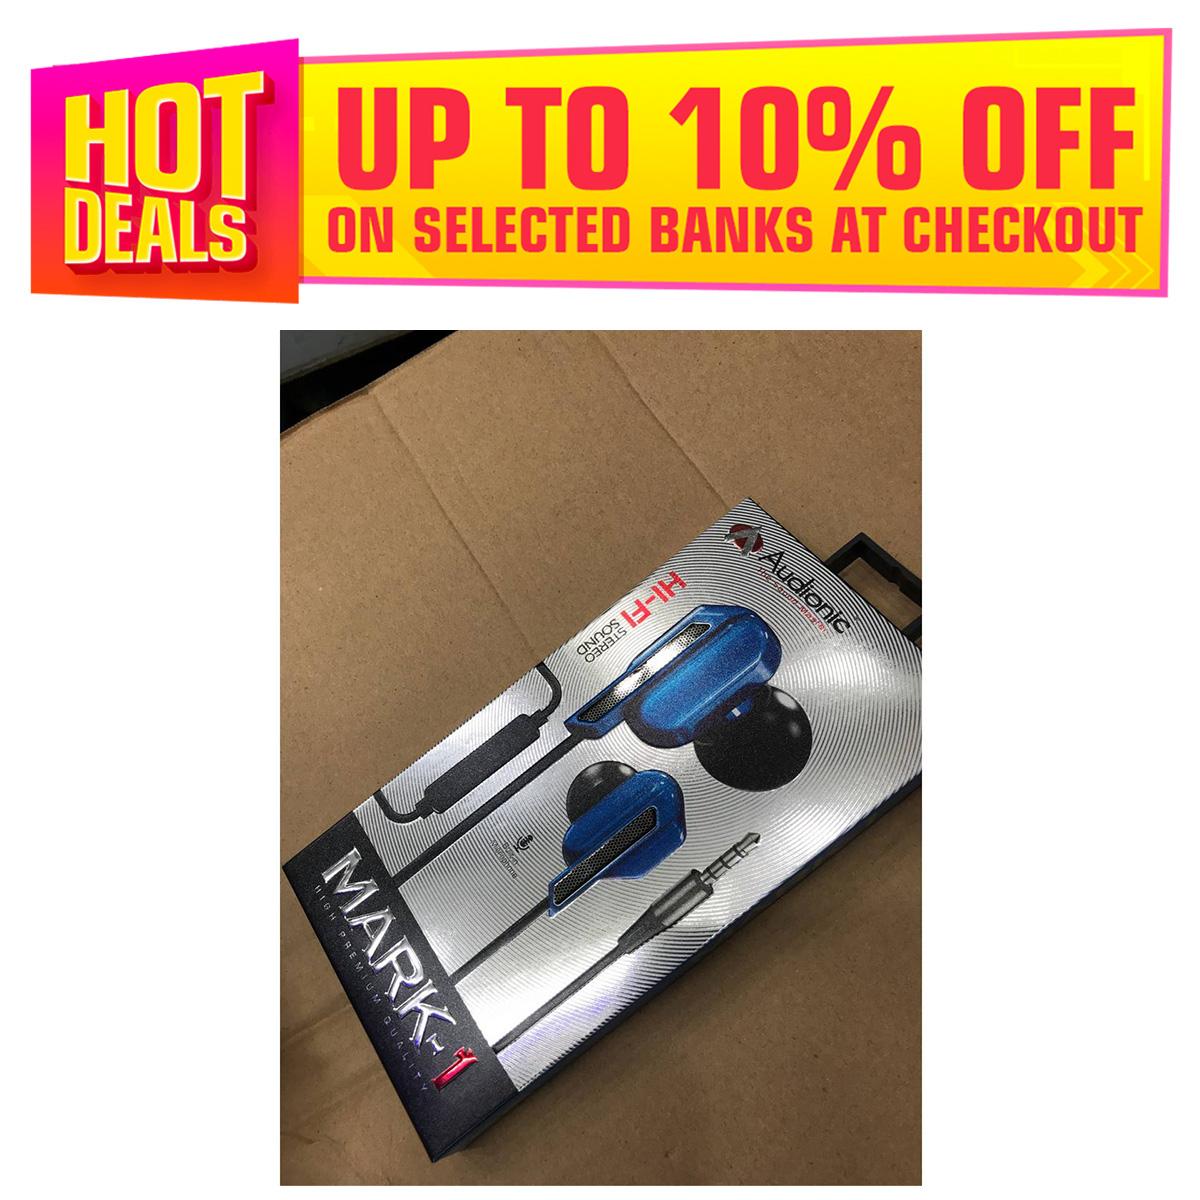 Branded Audionic Original Akasak Bluetooth Selfie Speaker Best Wireless Speaker for all Mobile Phone Rechargeable Speaker 1 Year Audionic Warranty